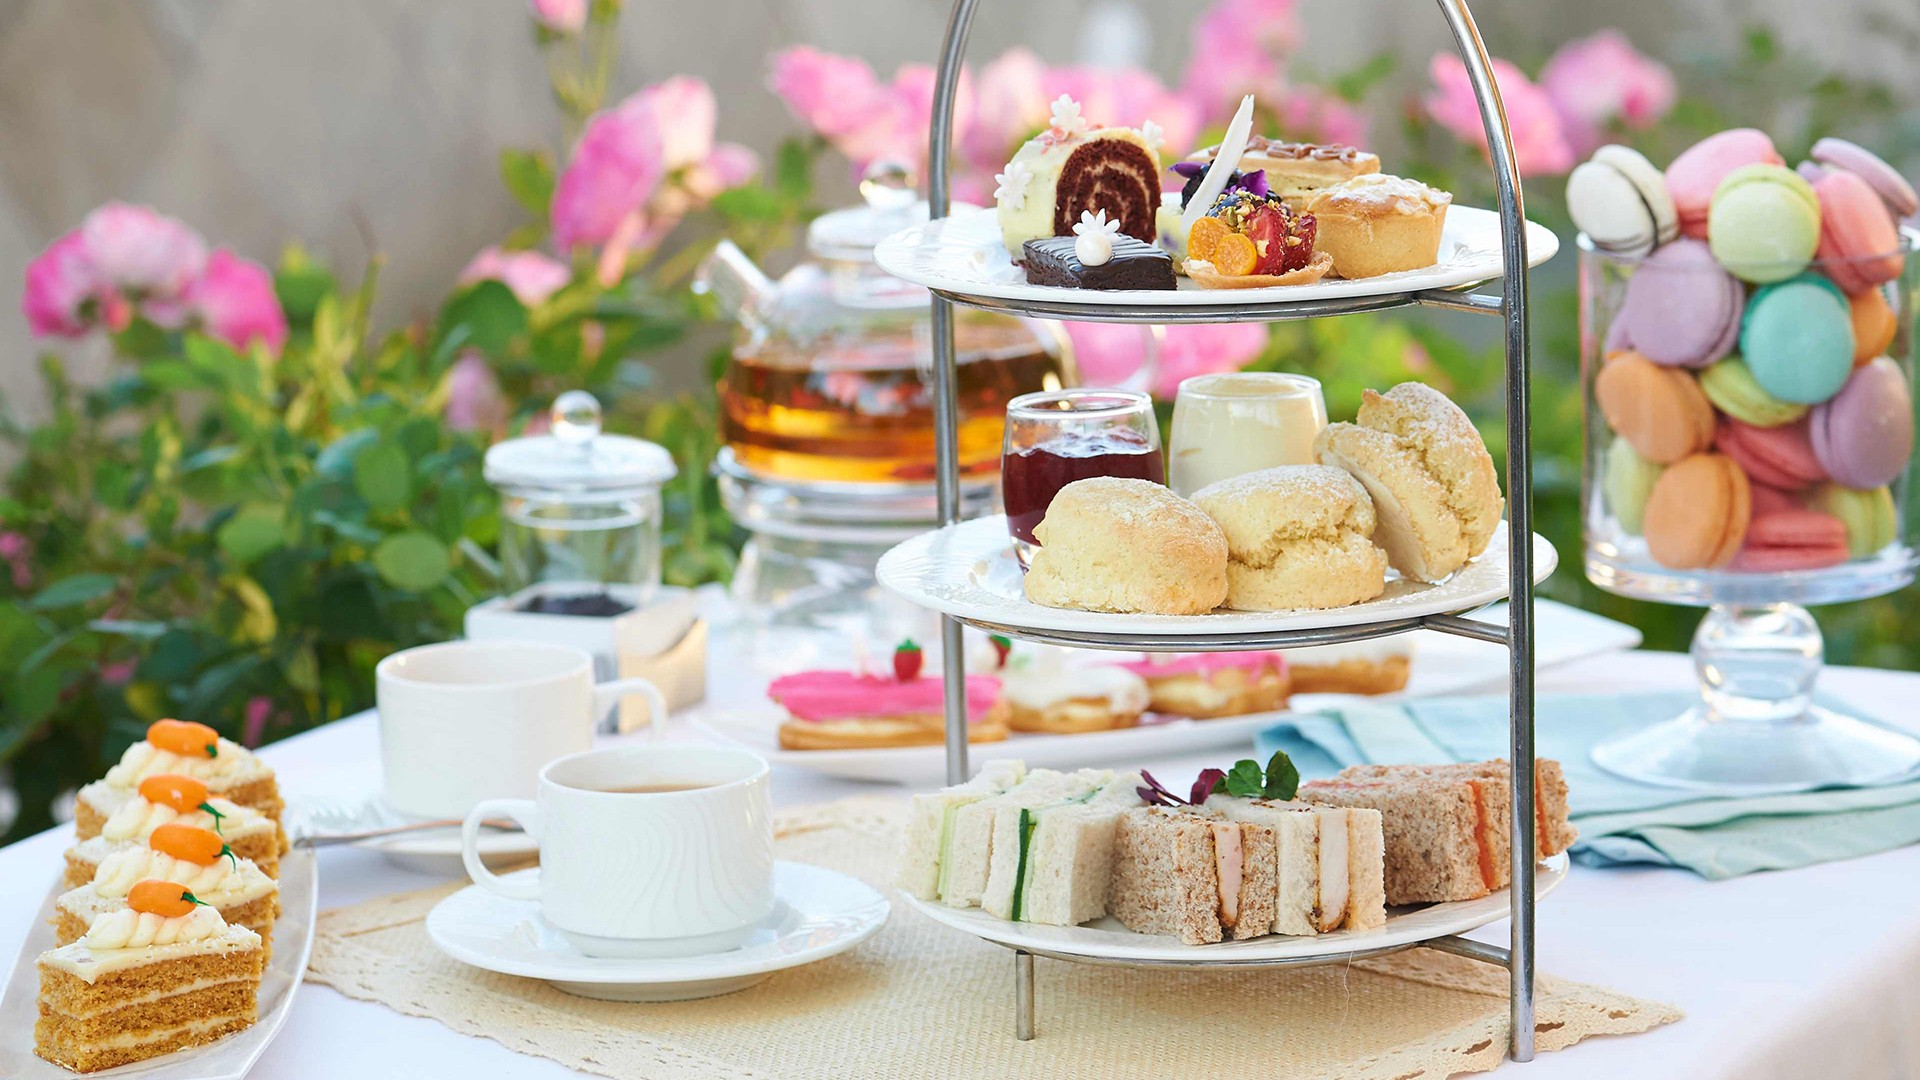 Afternoon High Tea